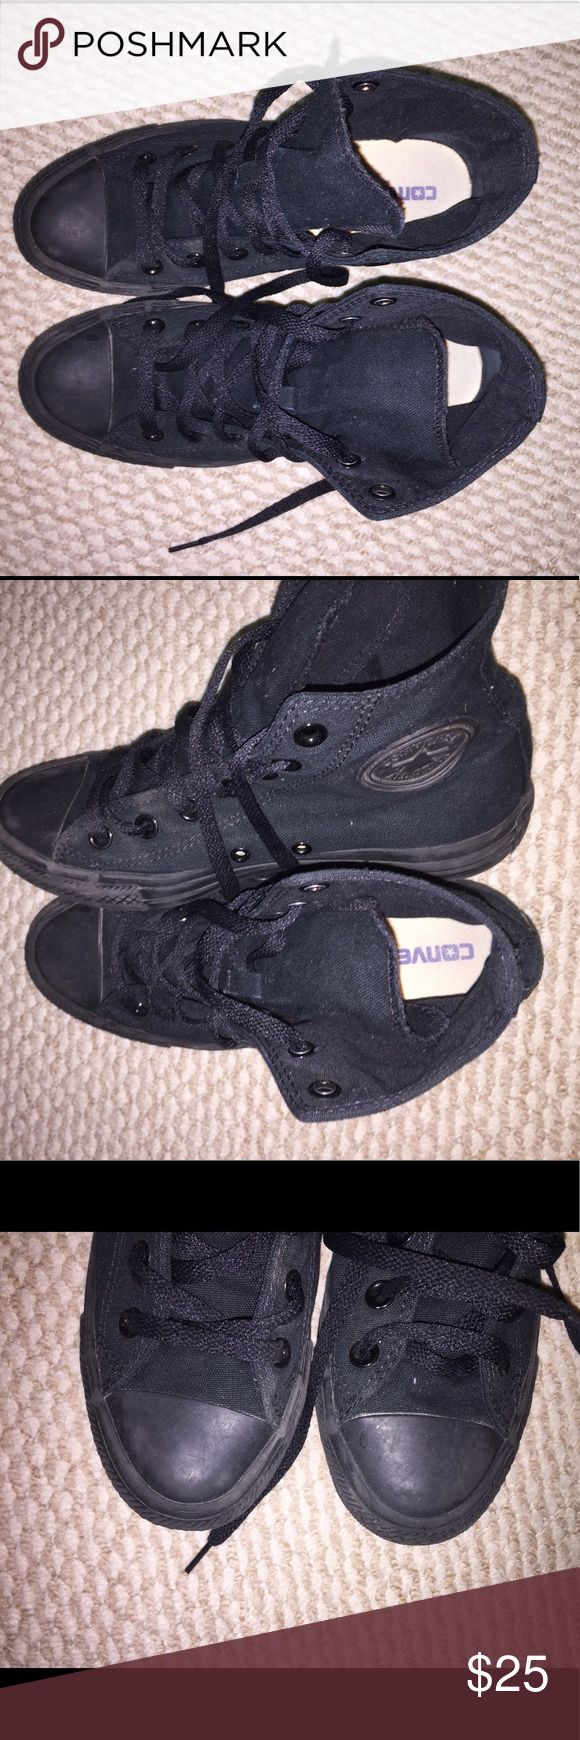 Black High Top Converse All Black High Top Converse. Worn a few times with a few scuffs. Men's 5 Women's 7 Converse Shoes Sneakers